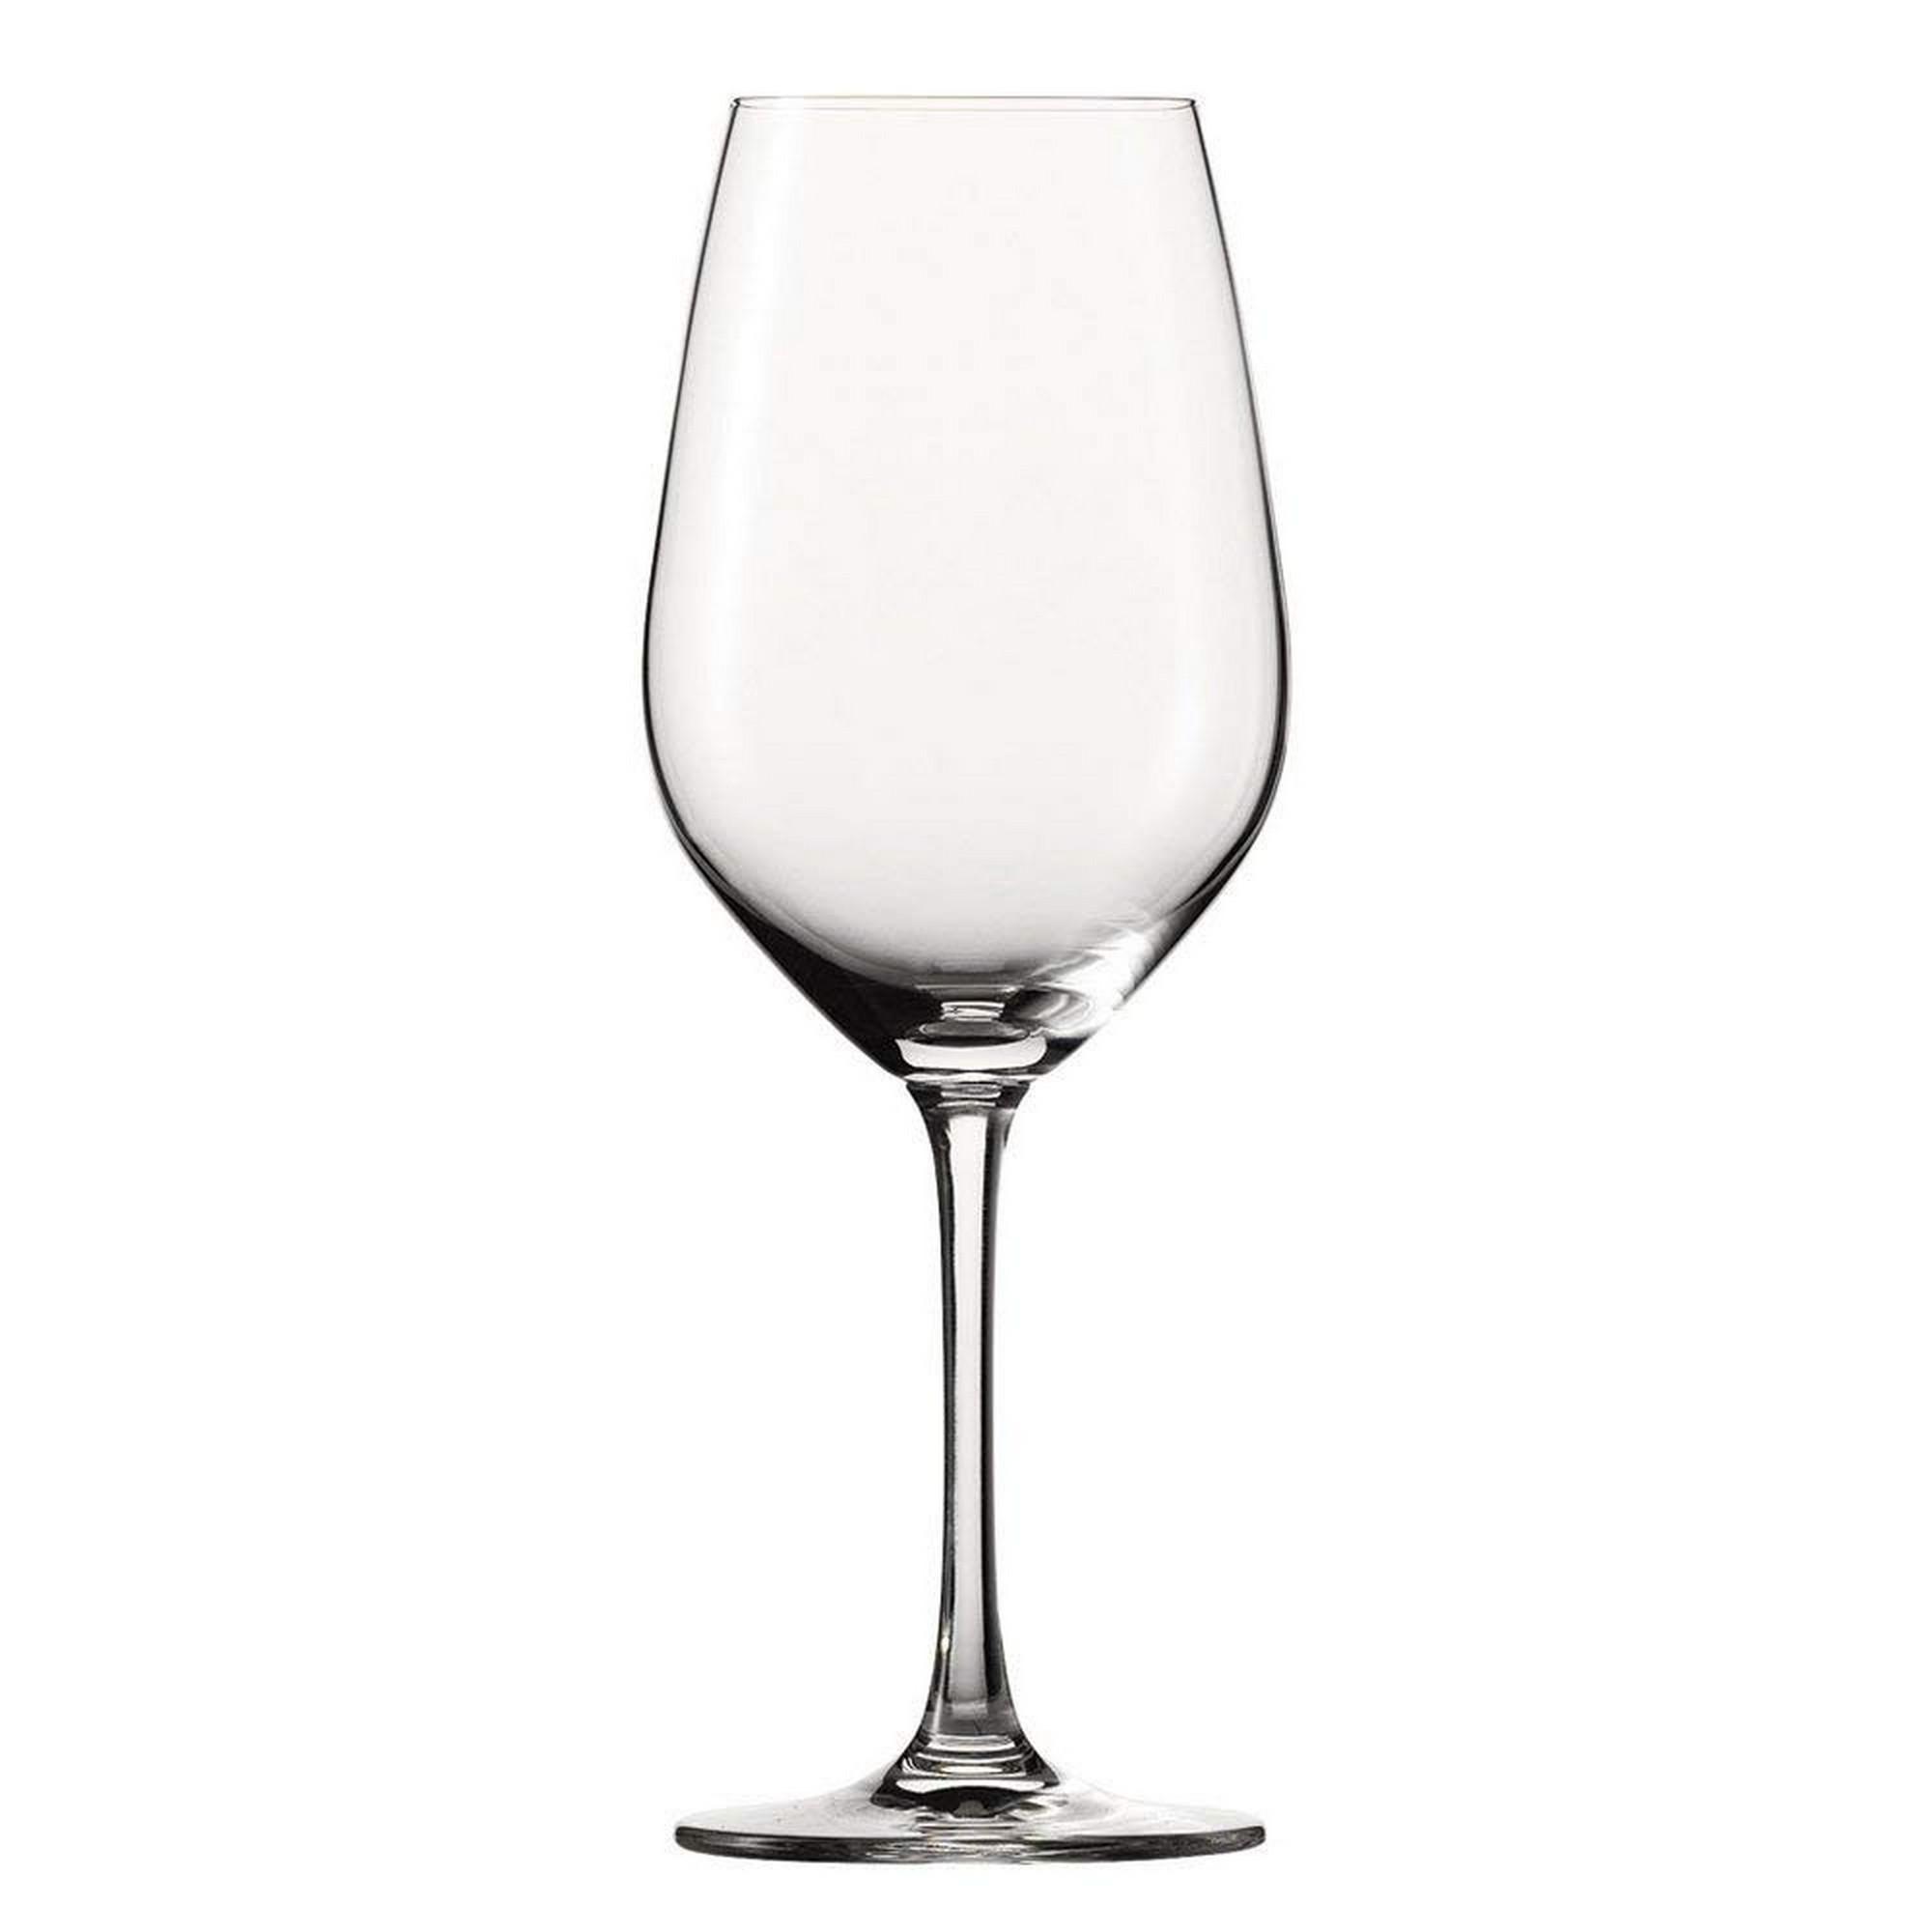 Taça para Borgonha 404ml Schott Zwiesel Viña 6 Peças de Cristal